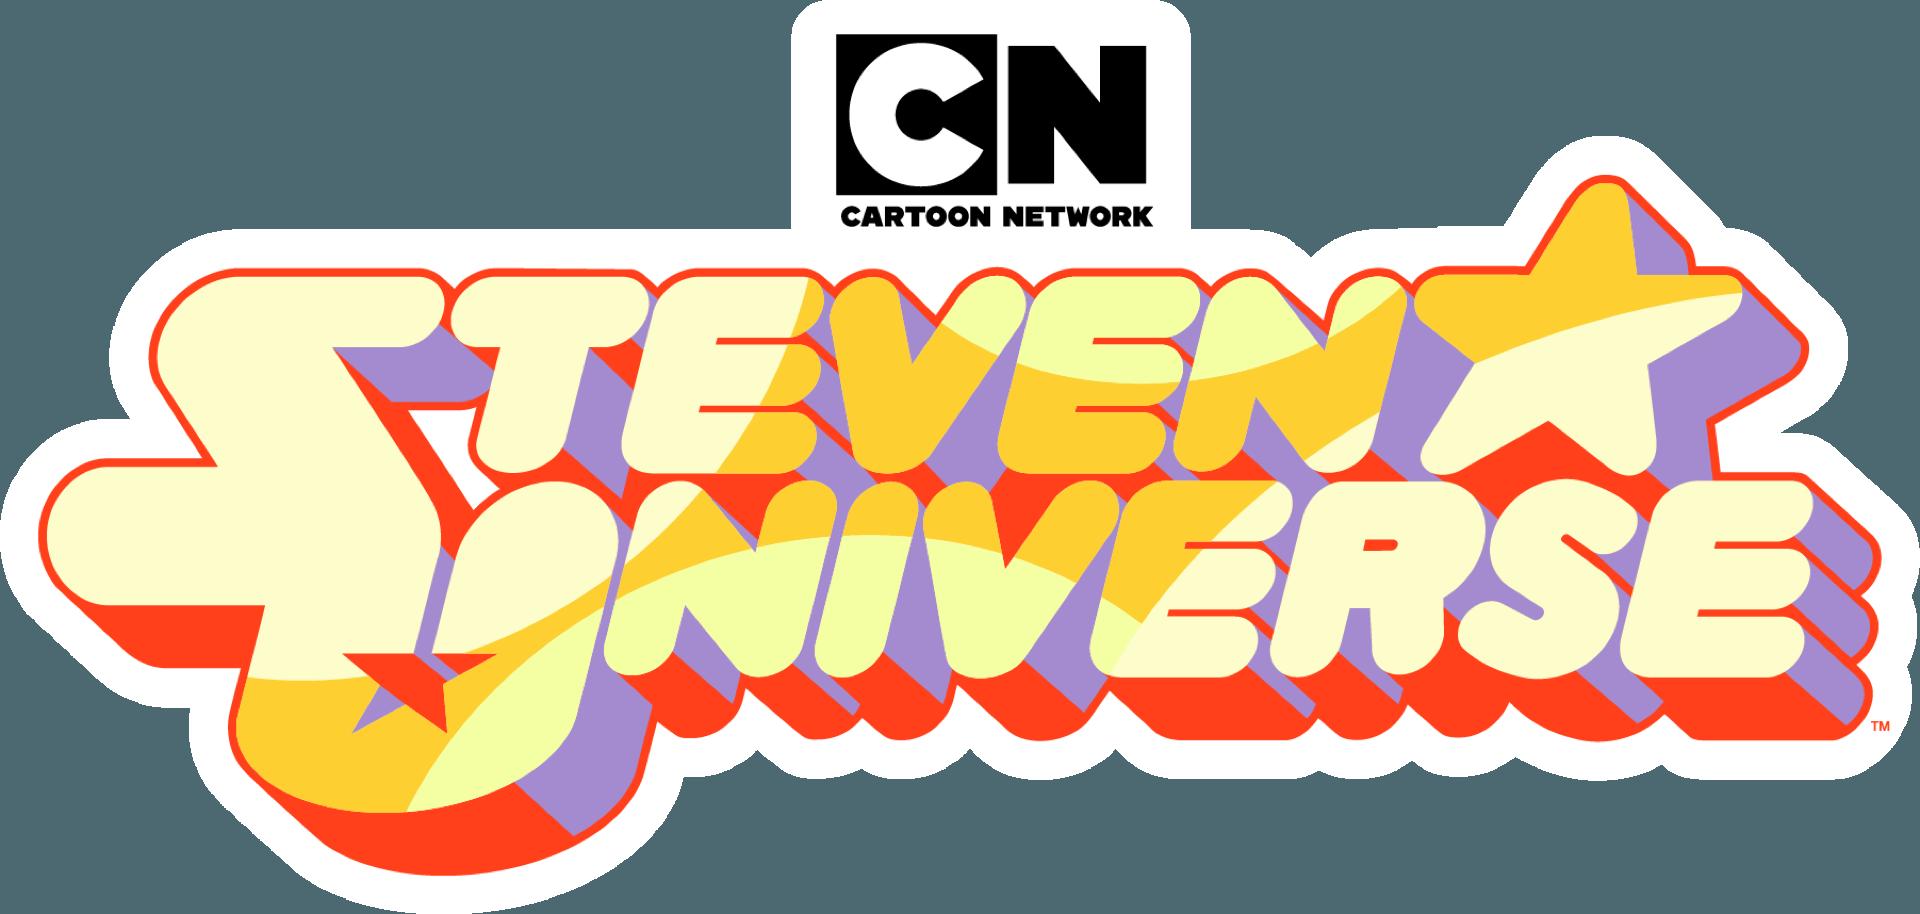 Cartoon Network Shows Logo - LogoDix